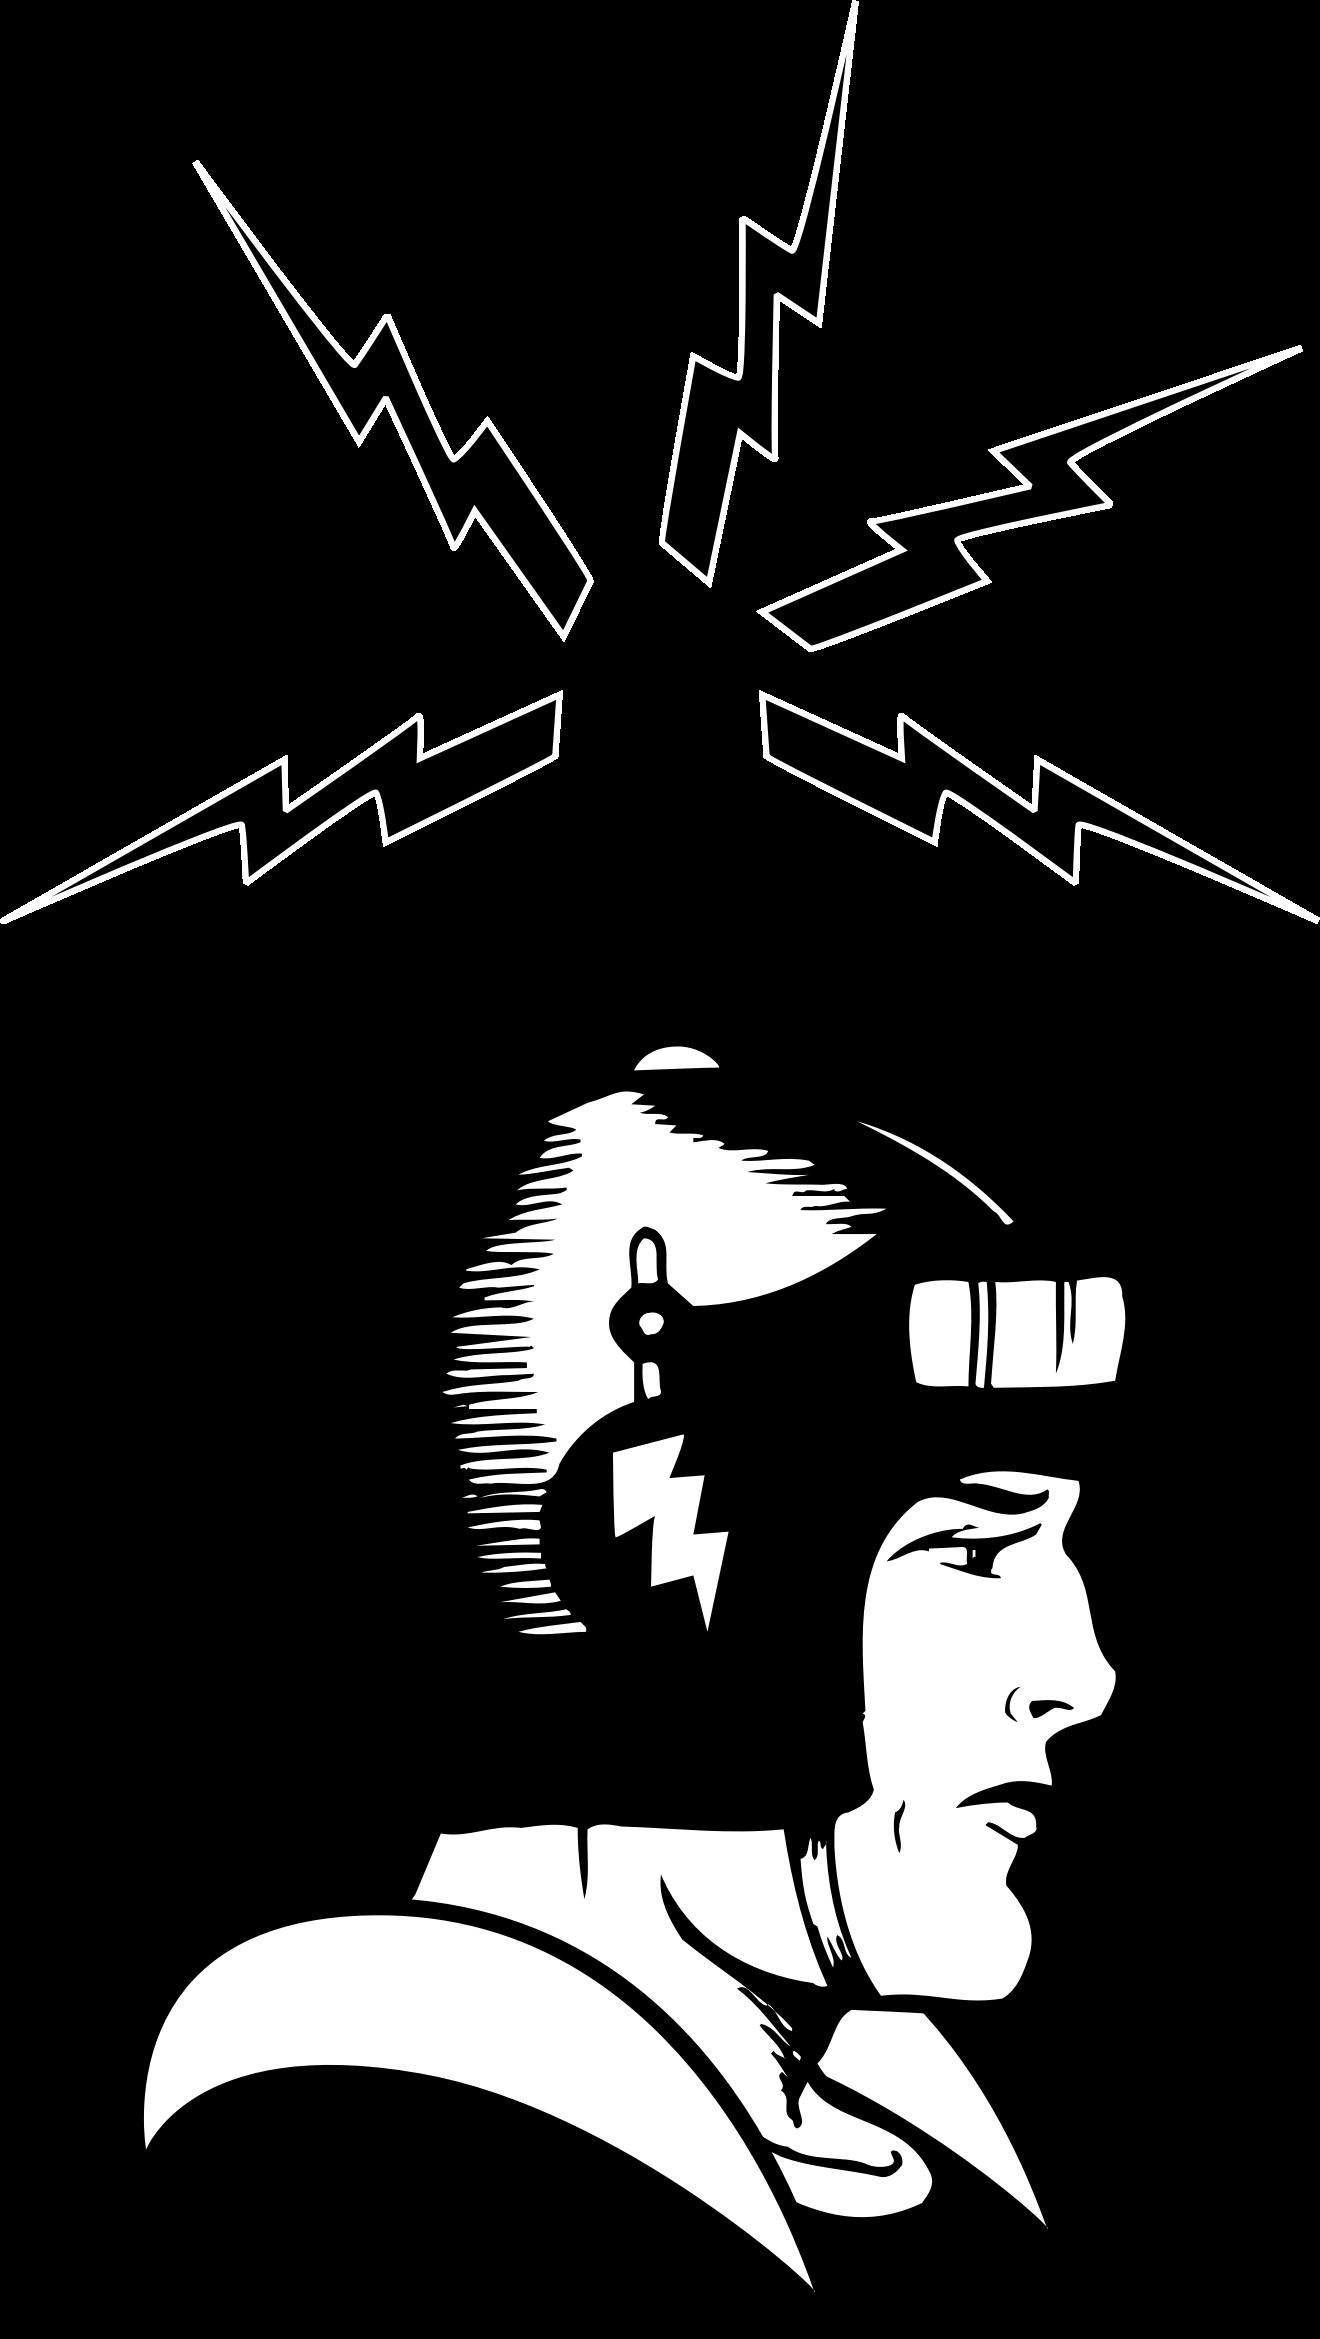 Retro clipart cowboy. Space cadet big image